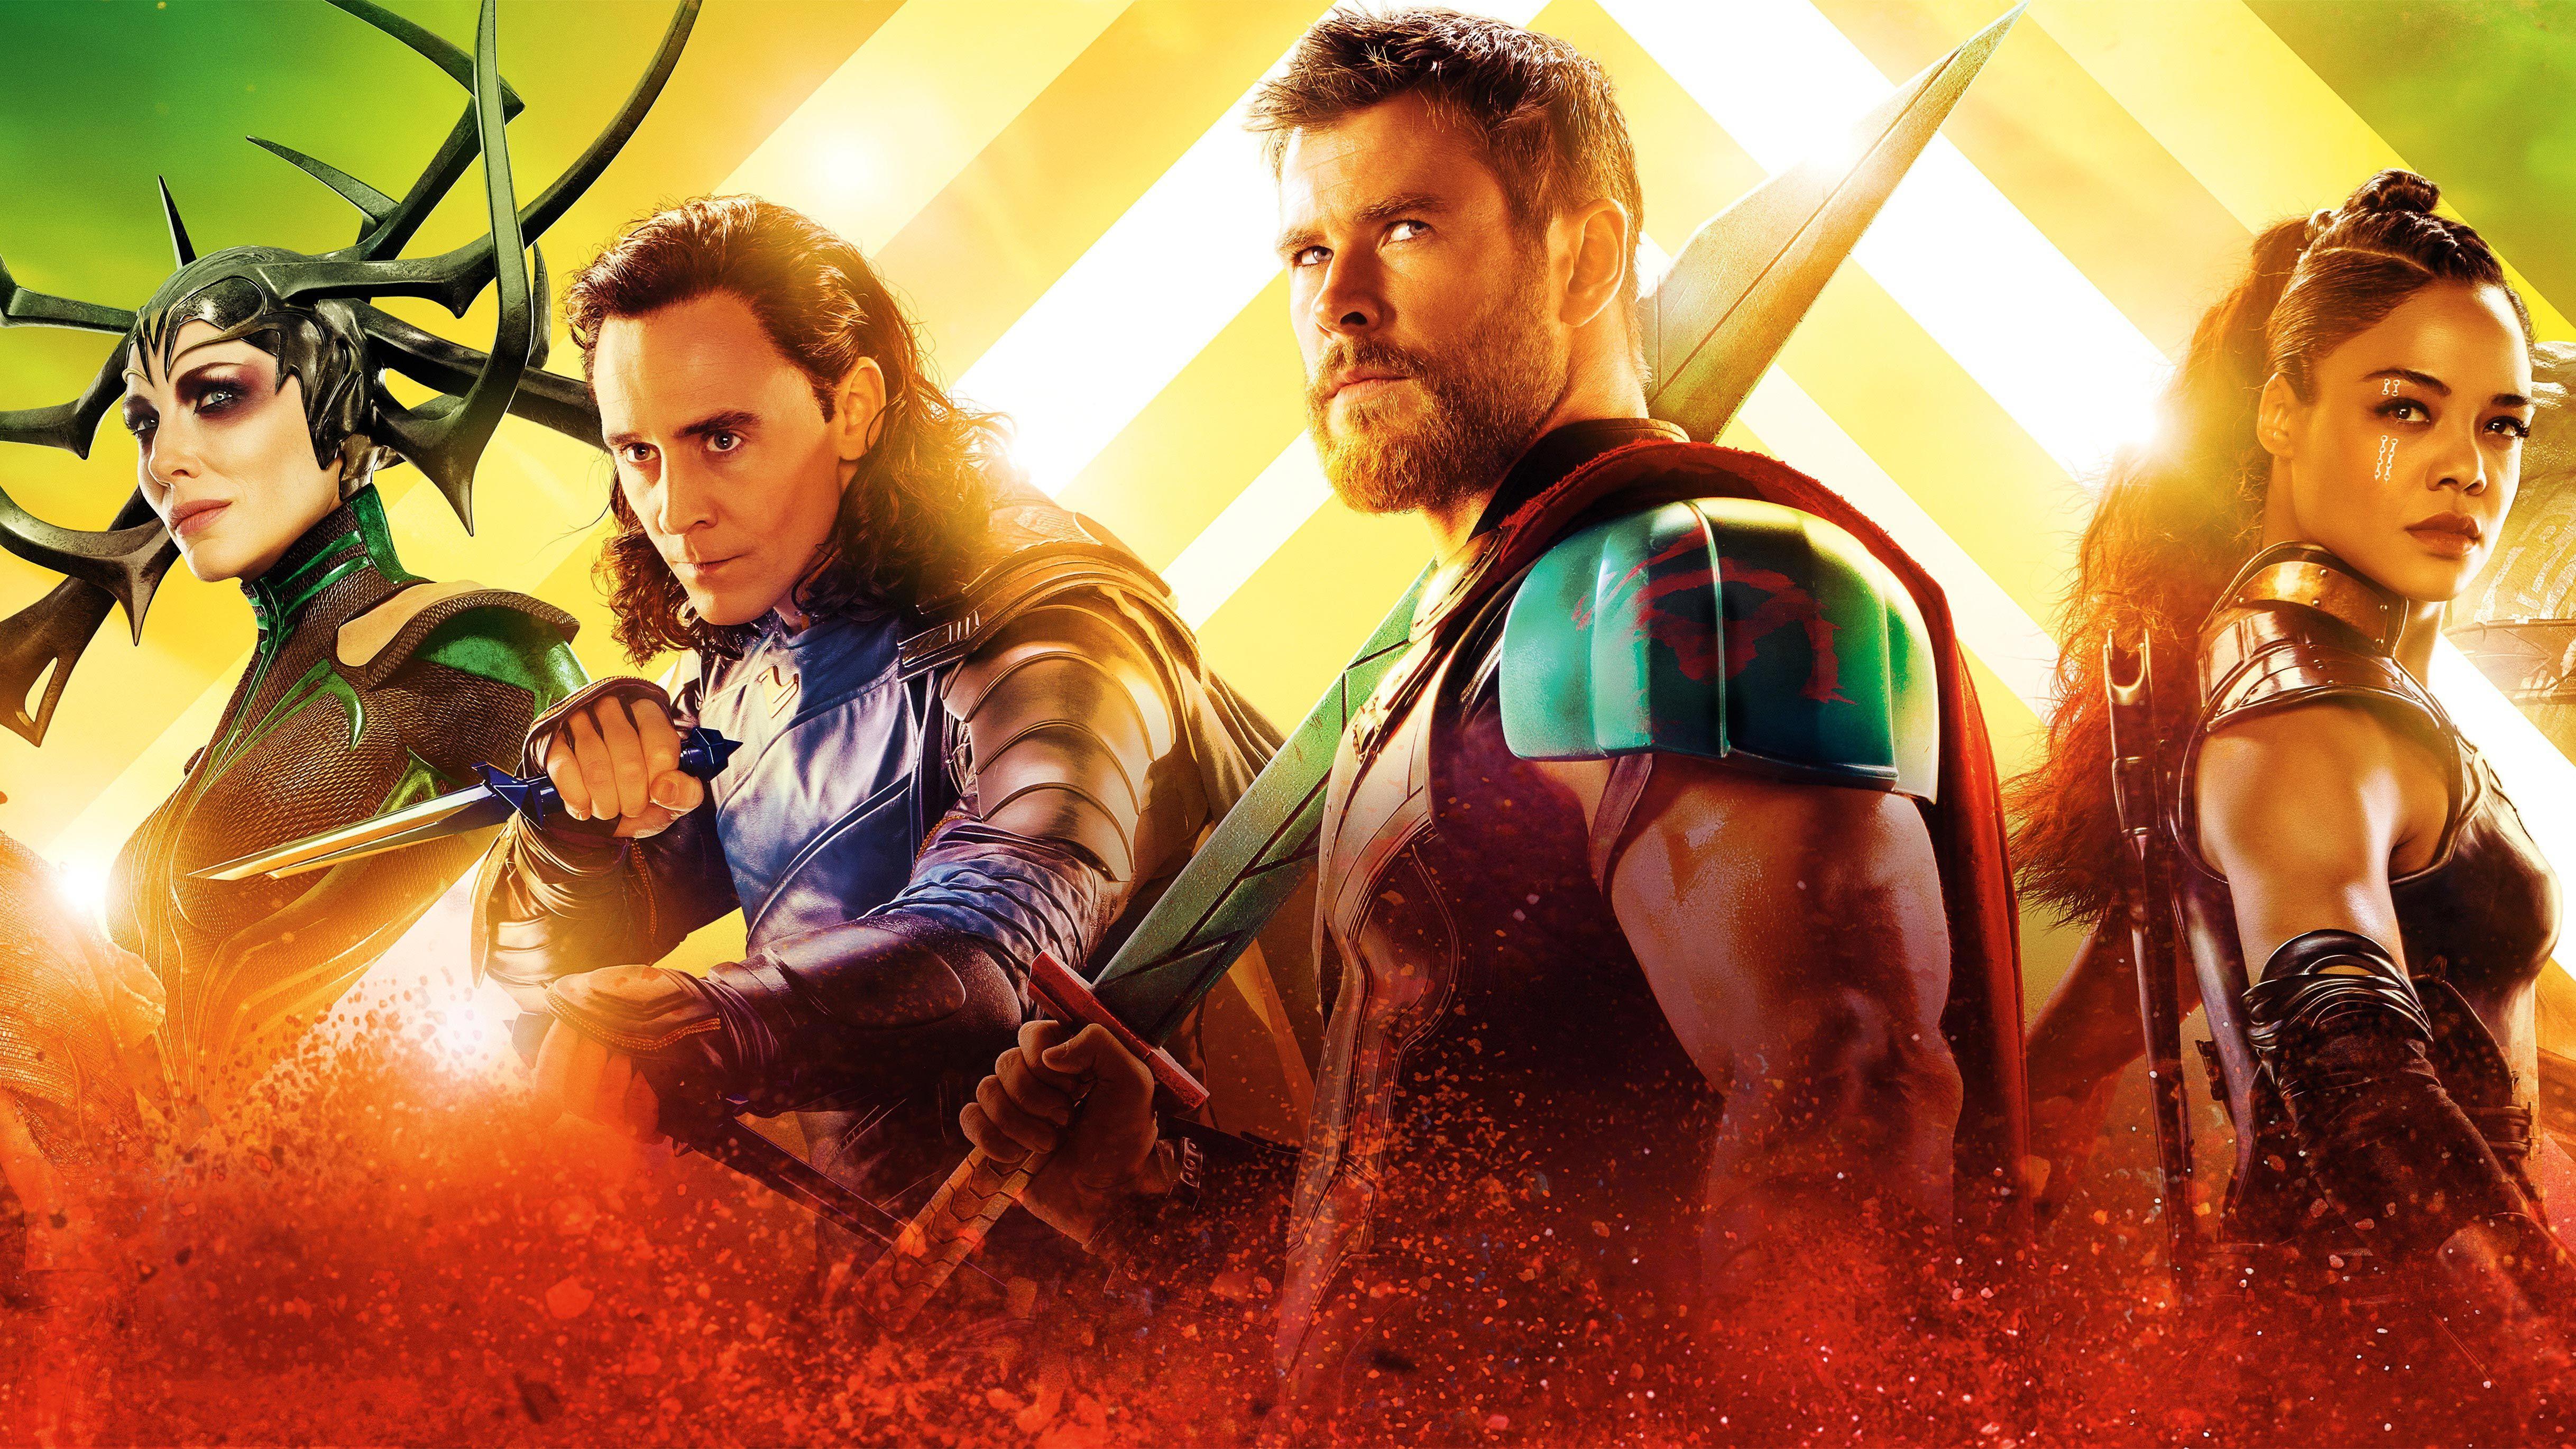 Thor Ragnarok Loki Wallpaper Hd Thor And Loki Wallpapers Wallpaper Cave thor and loki wallpapers wallpaper cave